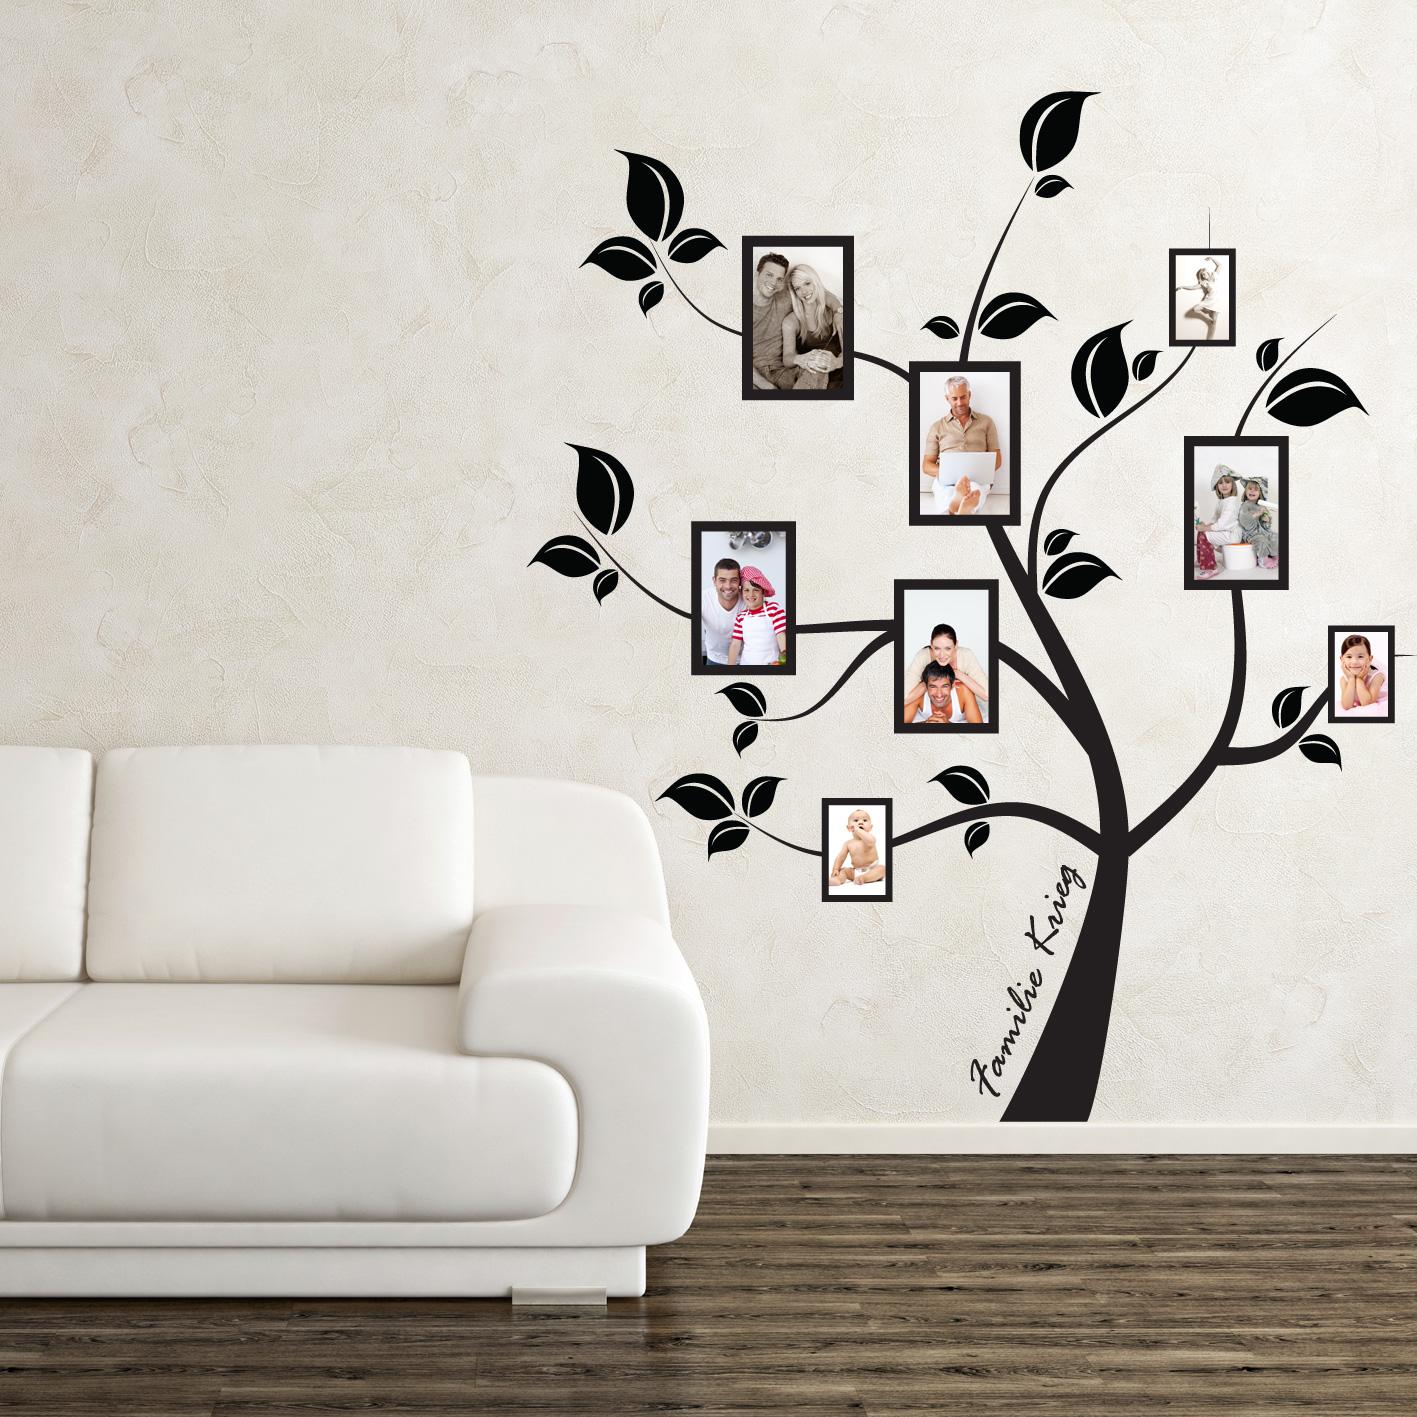 arborele familiei sticker perete stickere perete. Black Bedroom Furniture Sets. Home Design Ideas